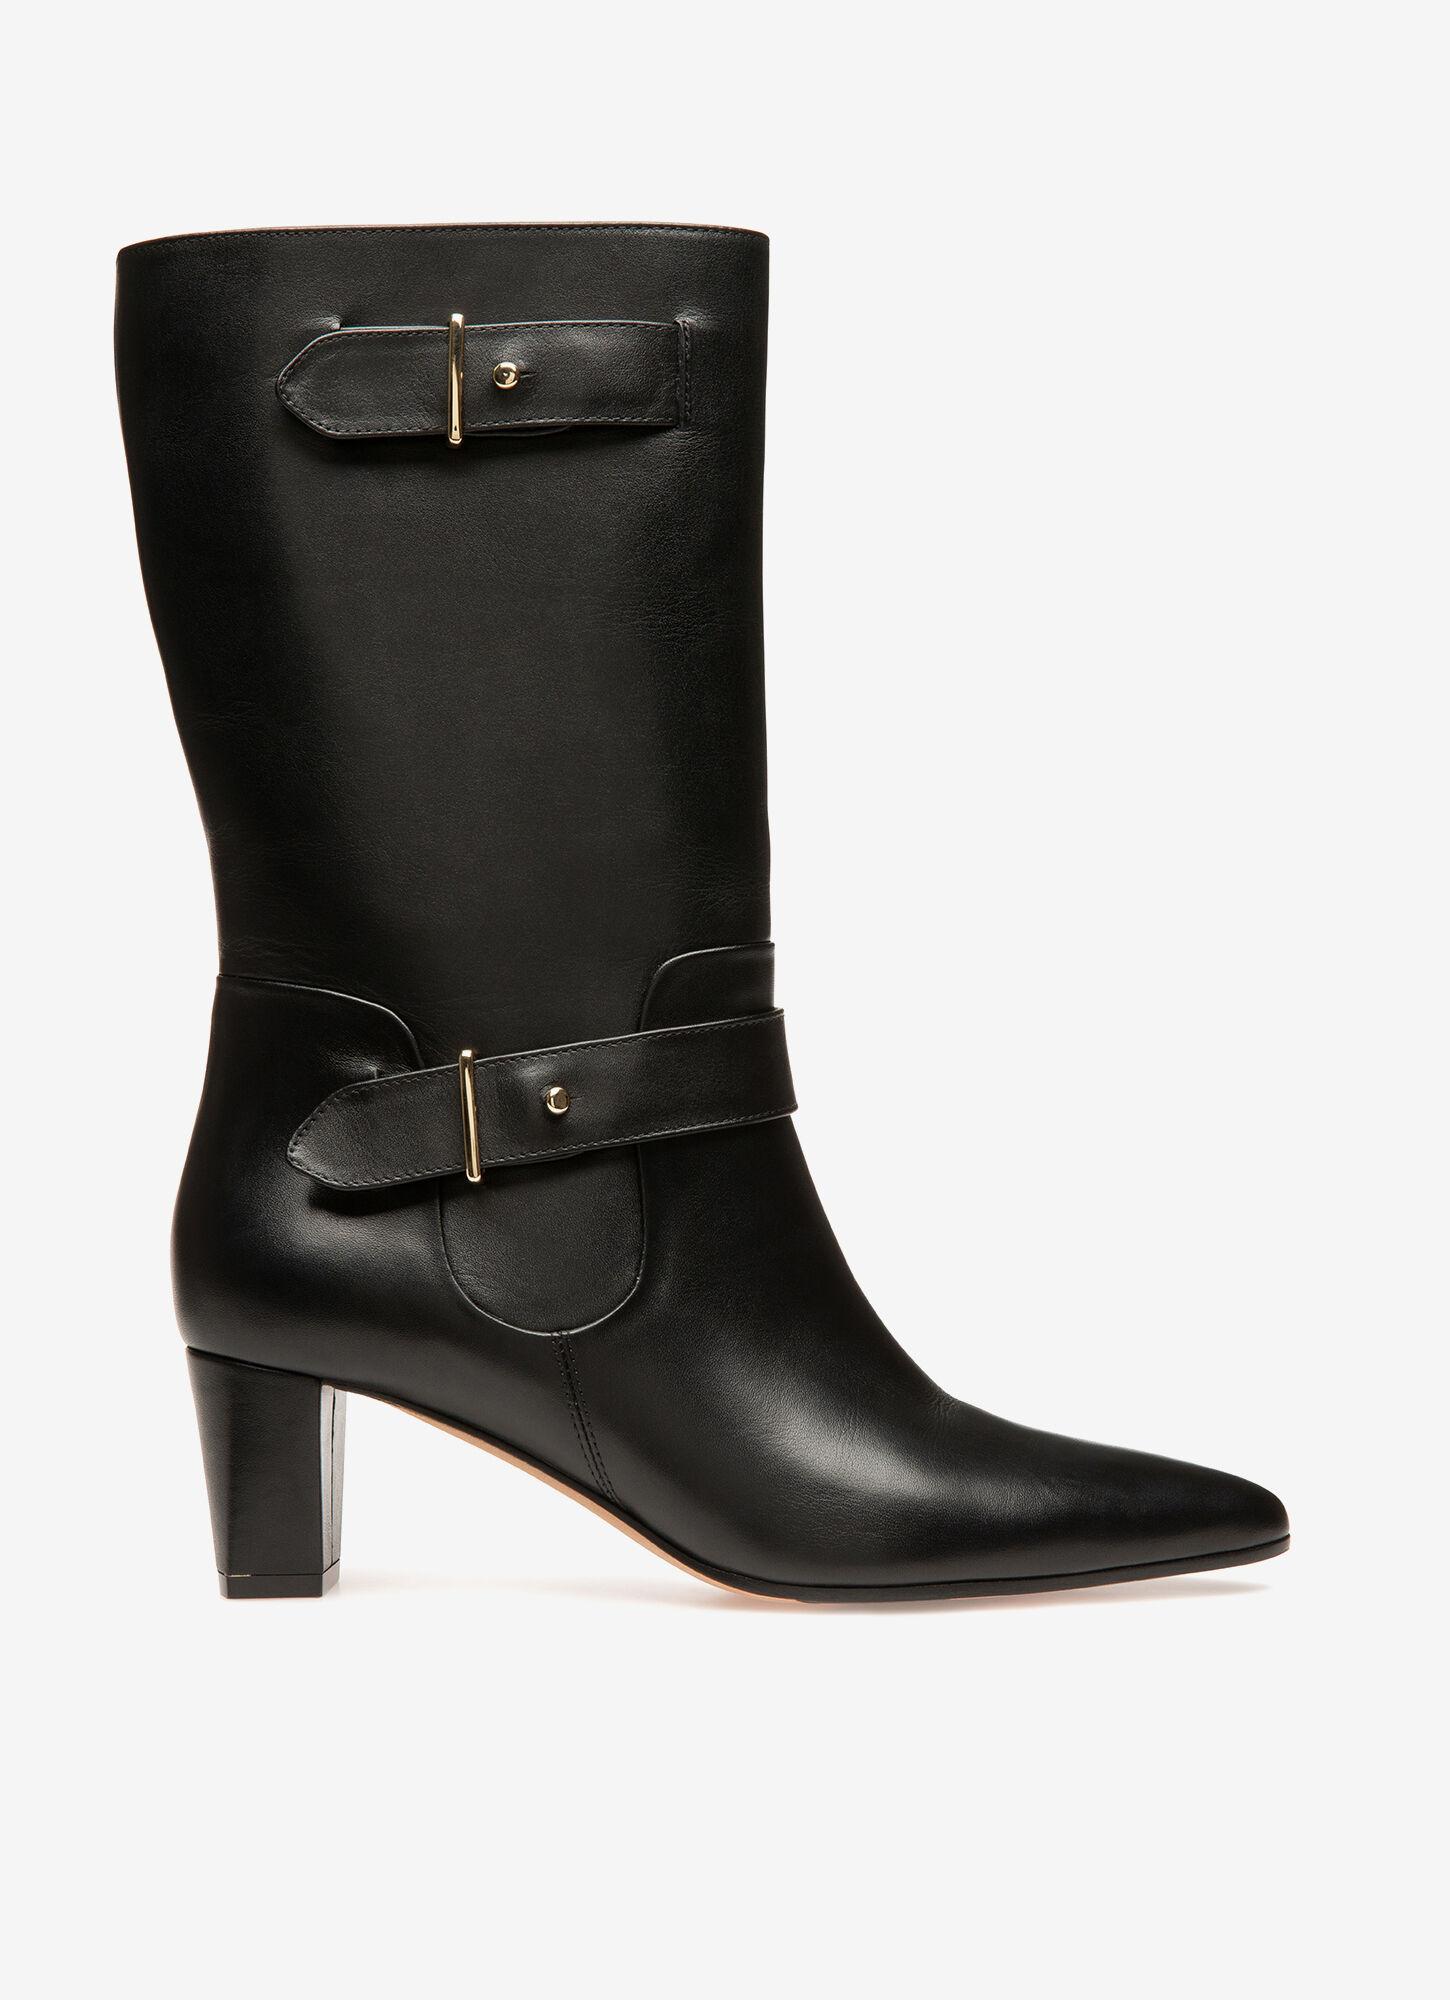 Women's Designer Boots| Bally